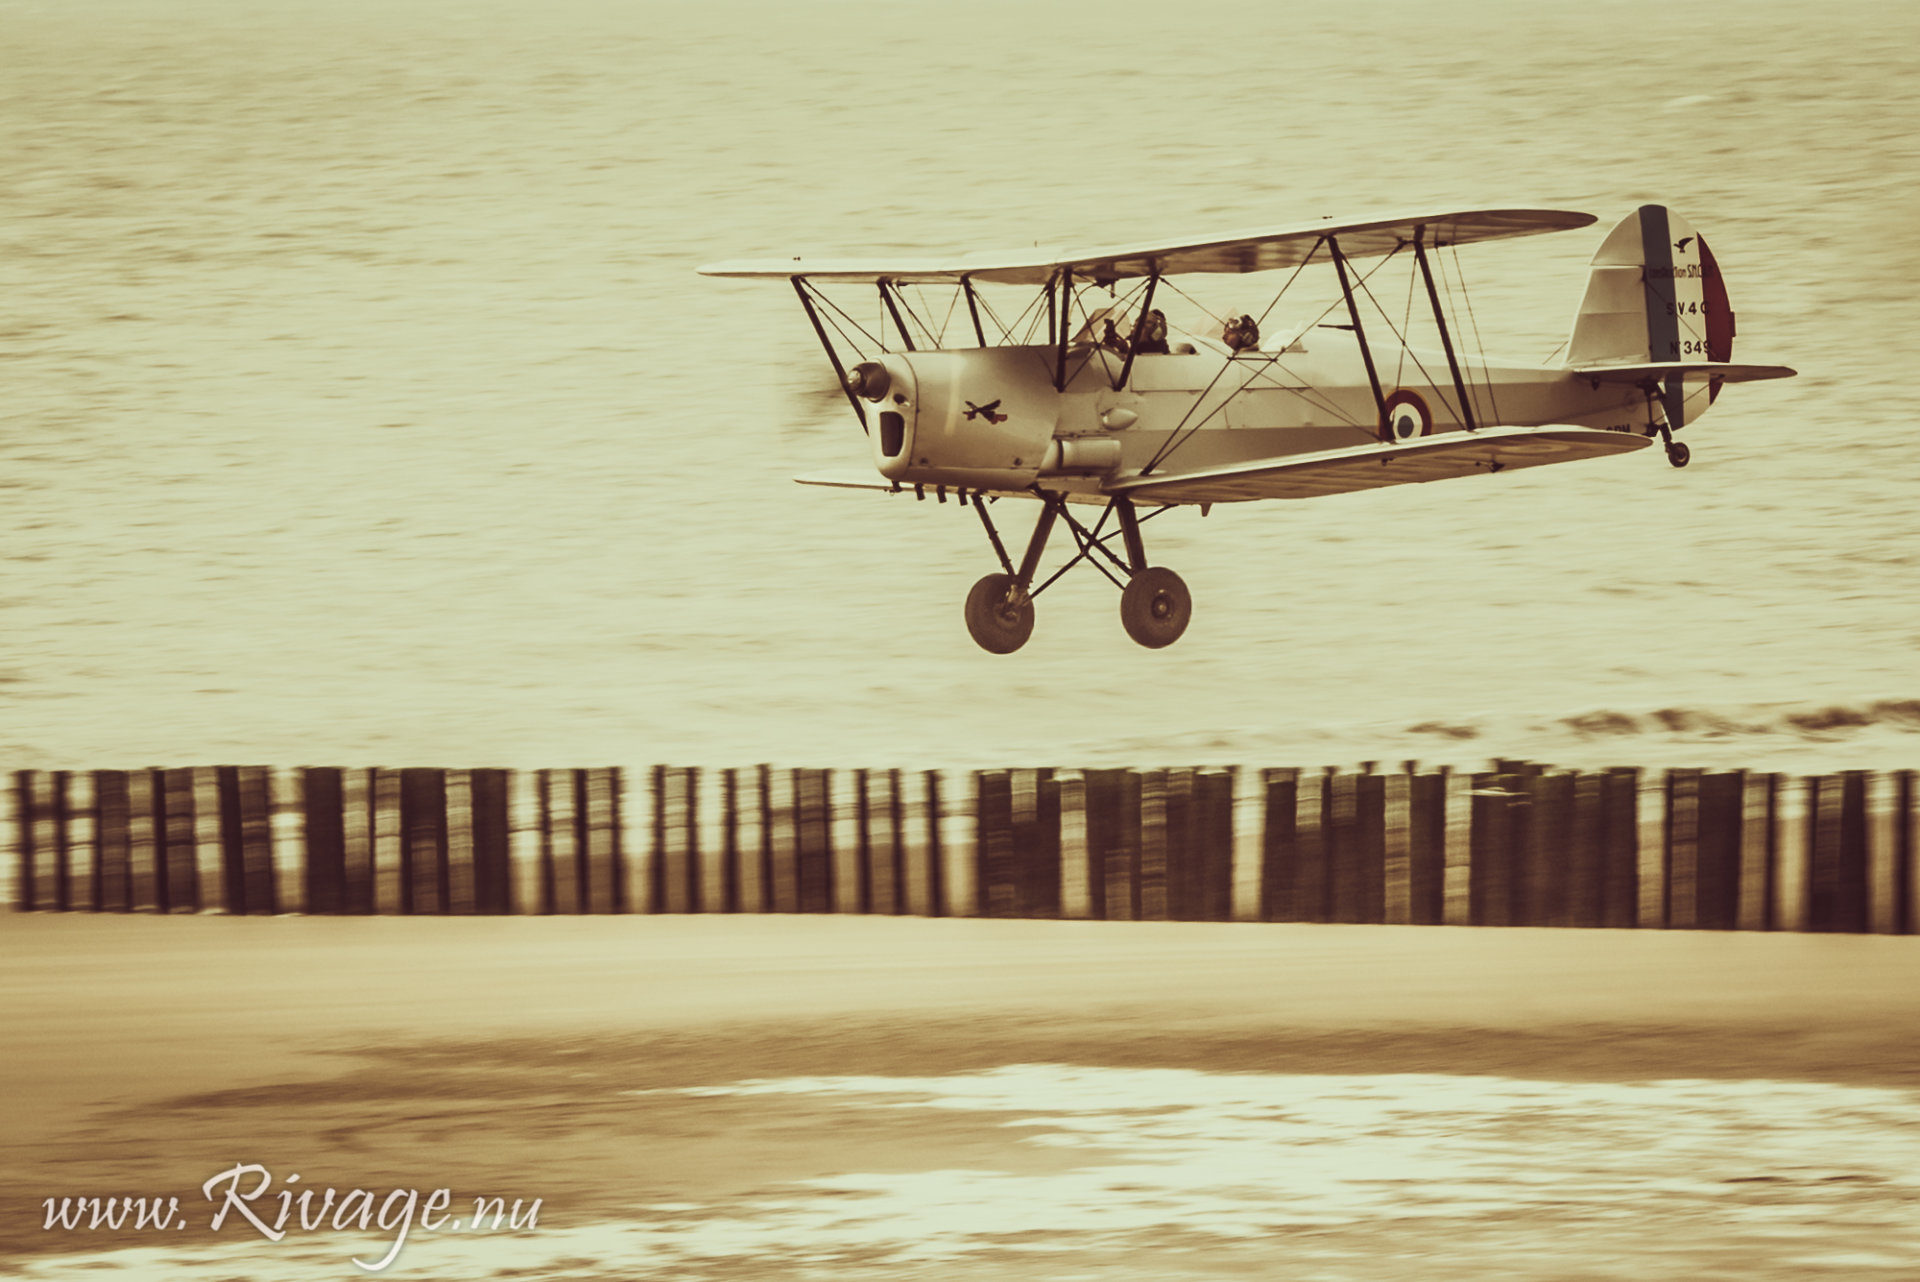 vintage dubbeldekker vliegtuig land op het strand